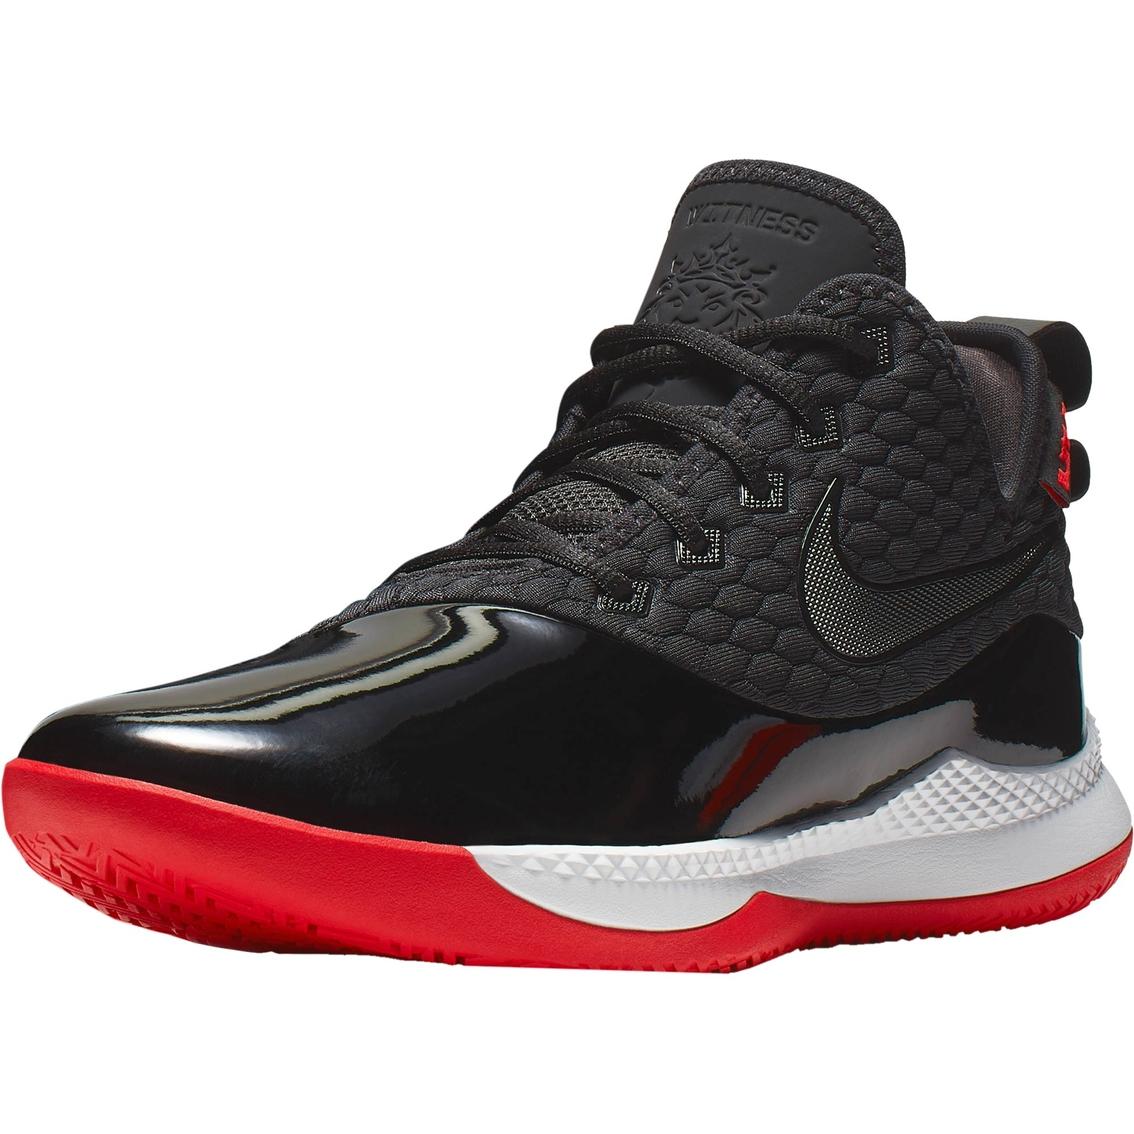 188401f9162d Nike Men s Lebron Witness Iii Prm Basketball Shoes